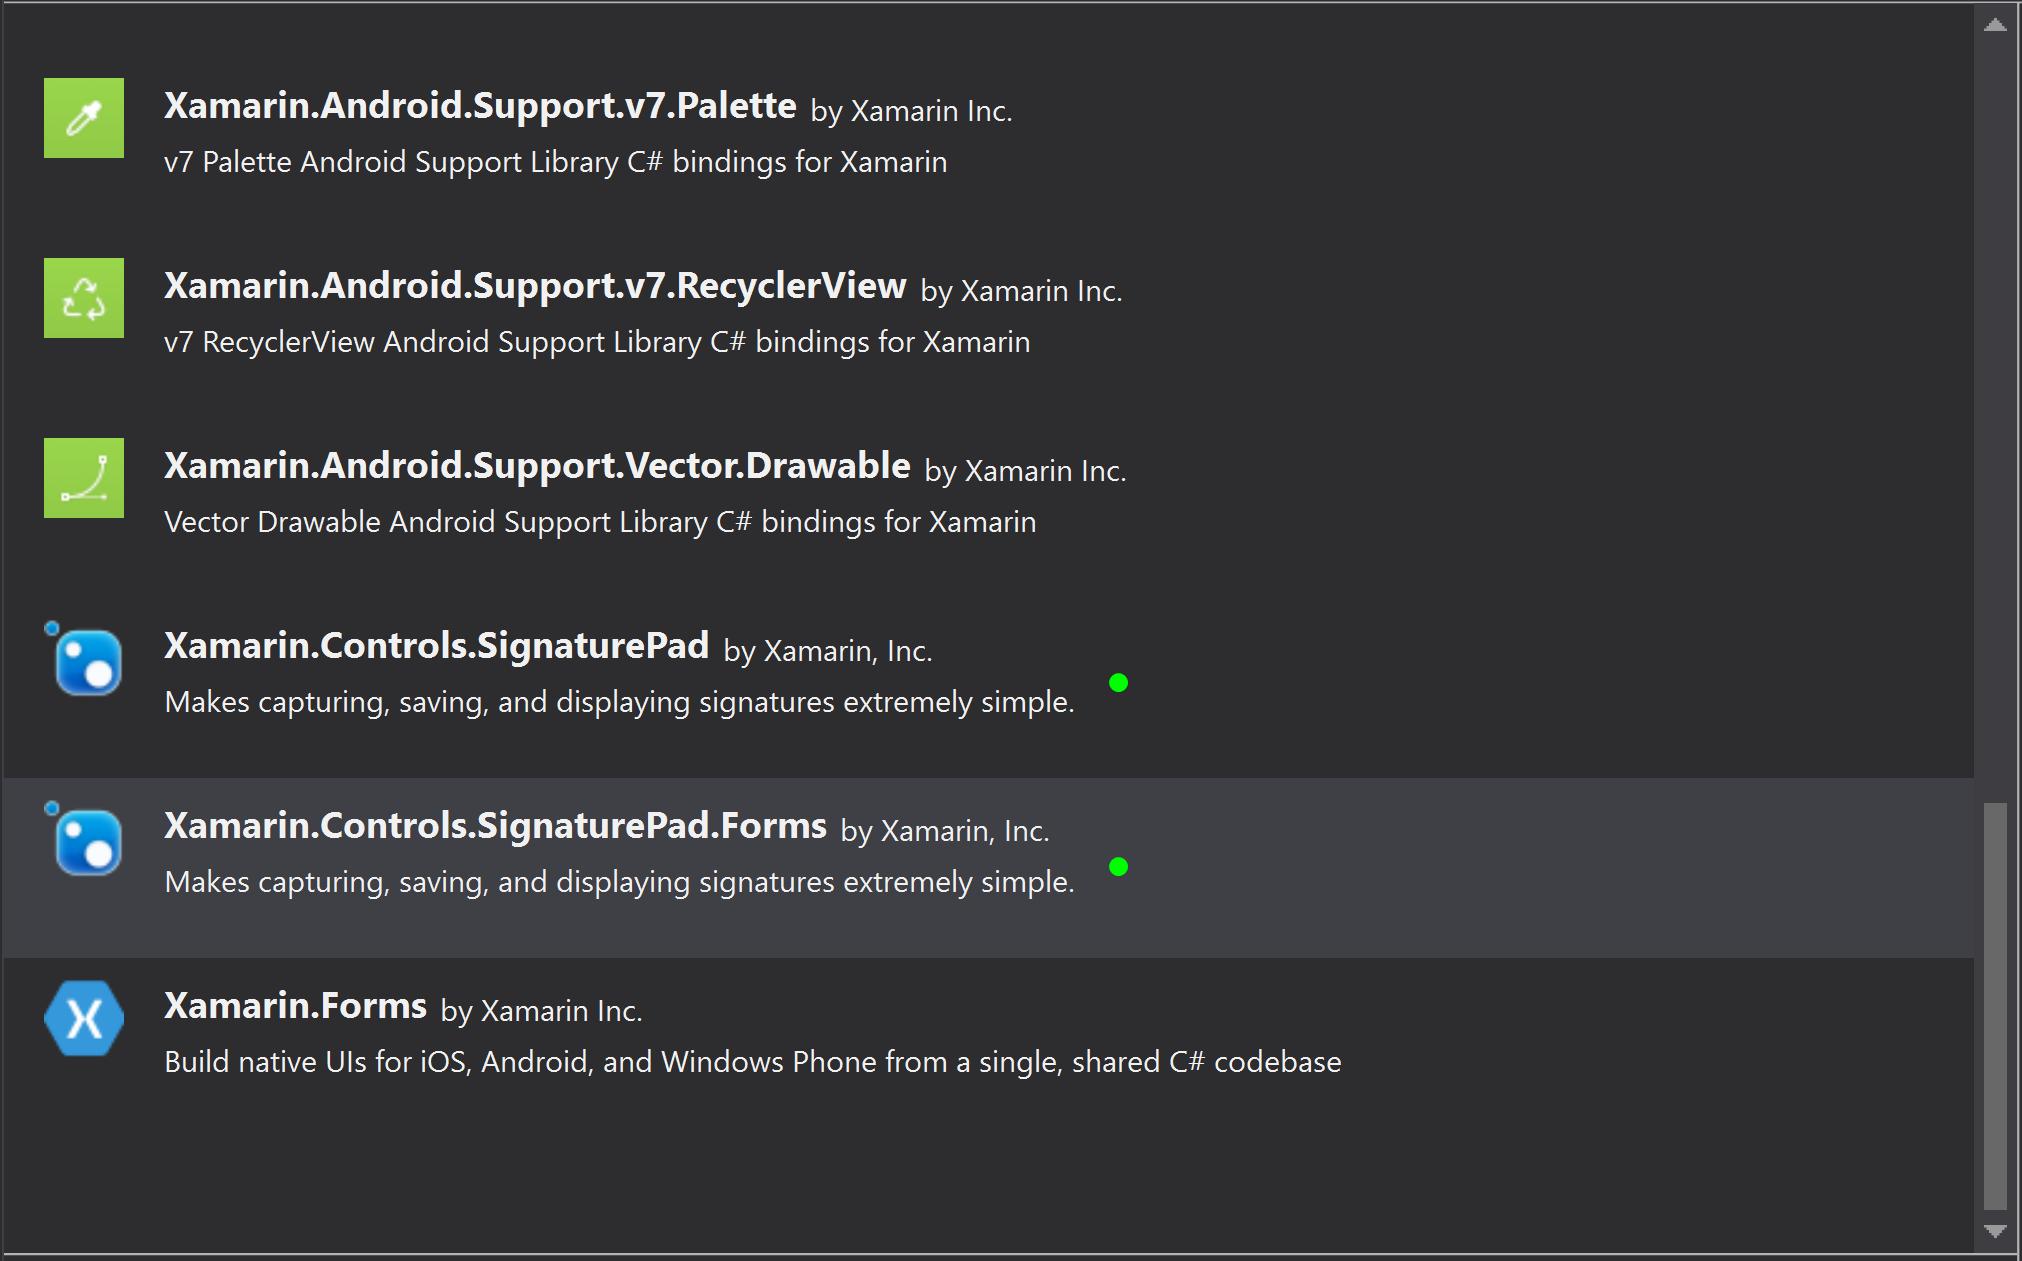 SignaturePad Xamarin Forms